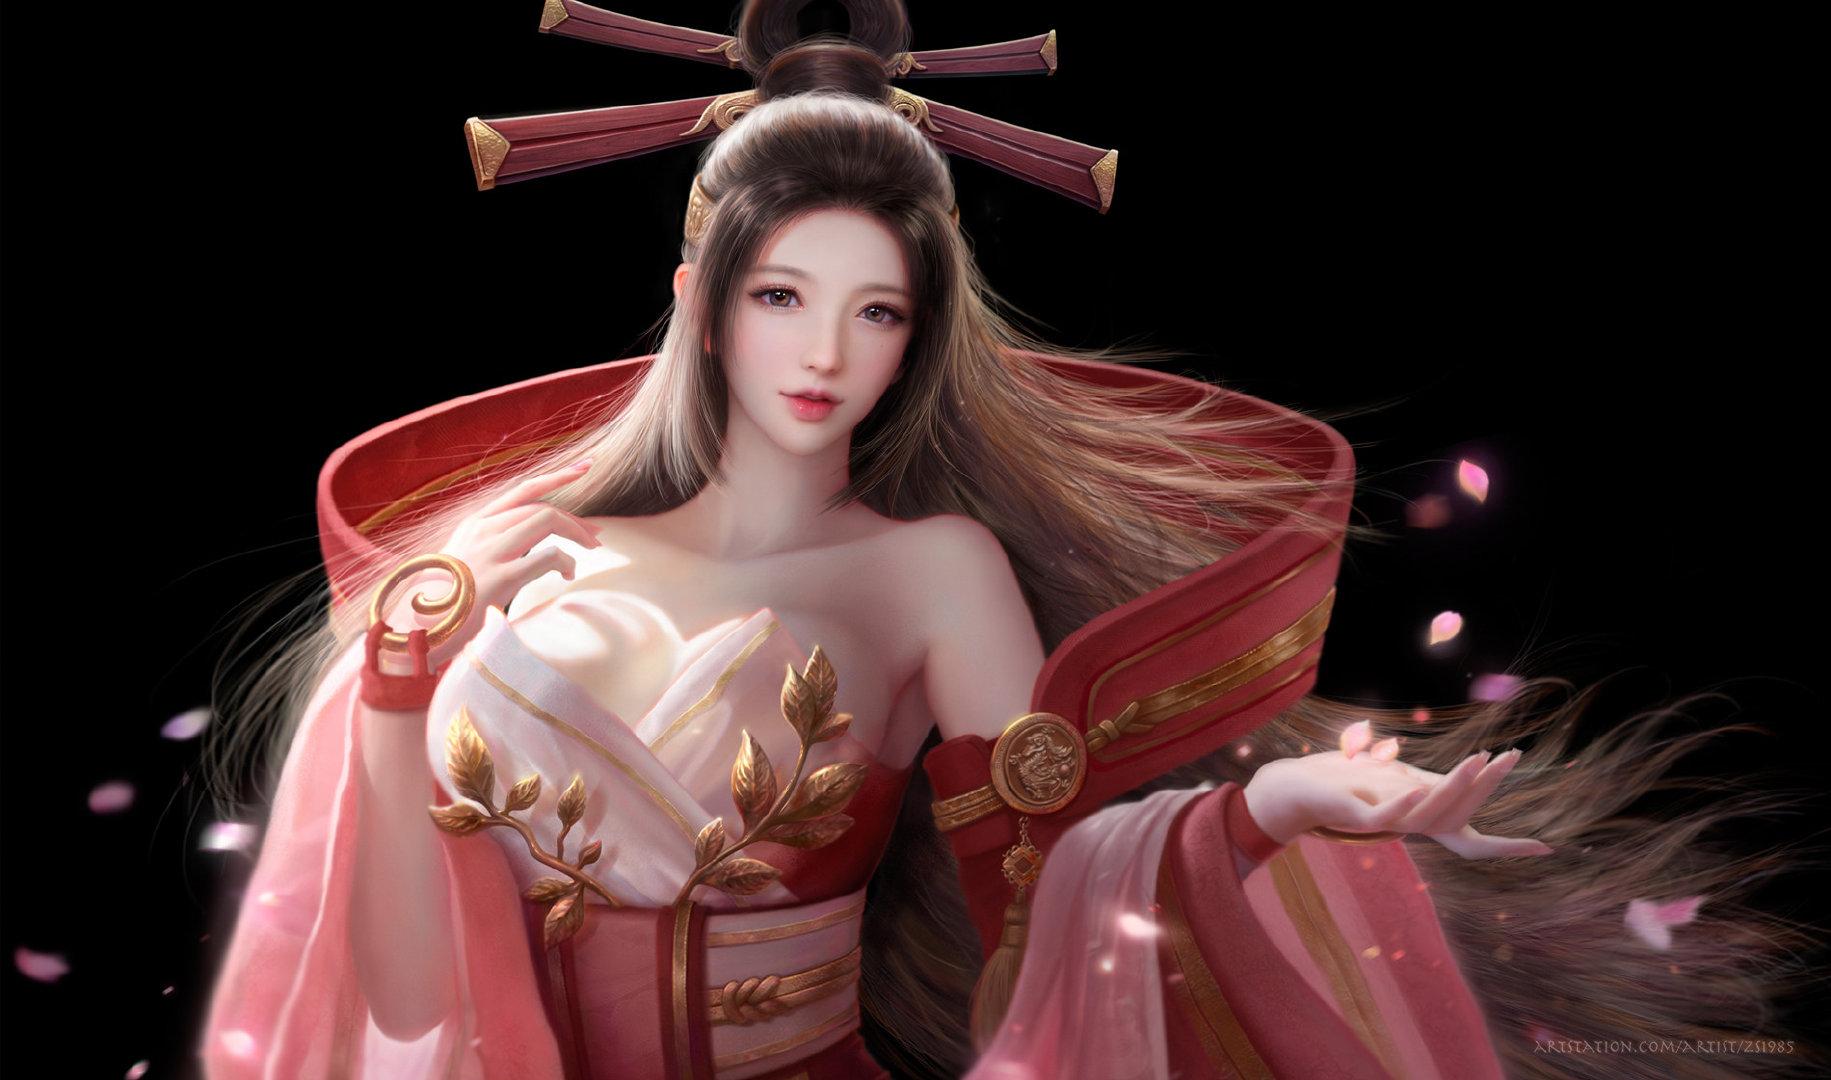 Ruoxin Zhang插画图片下载